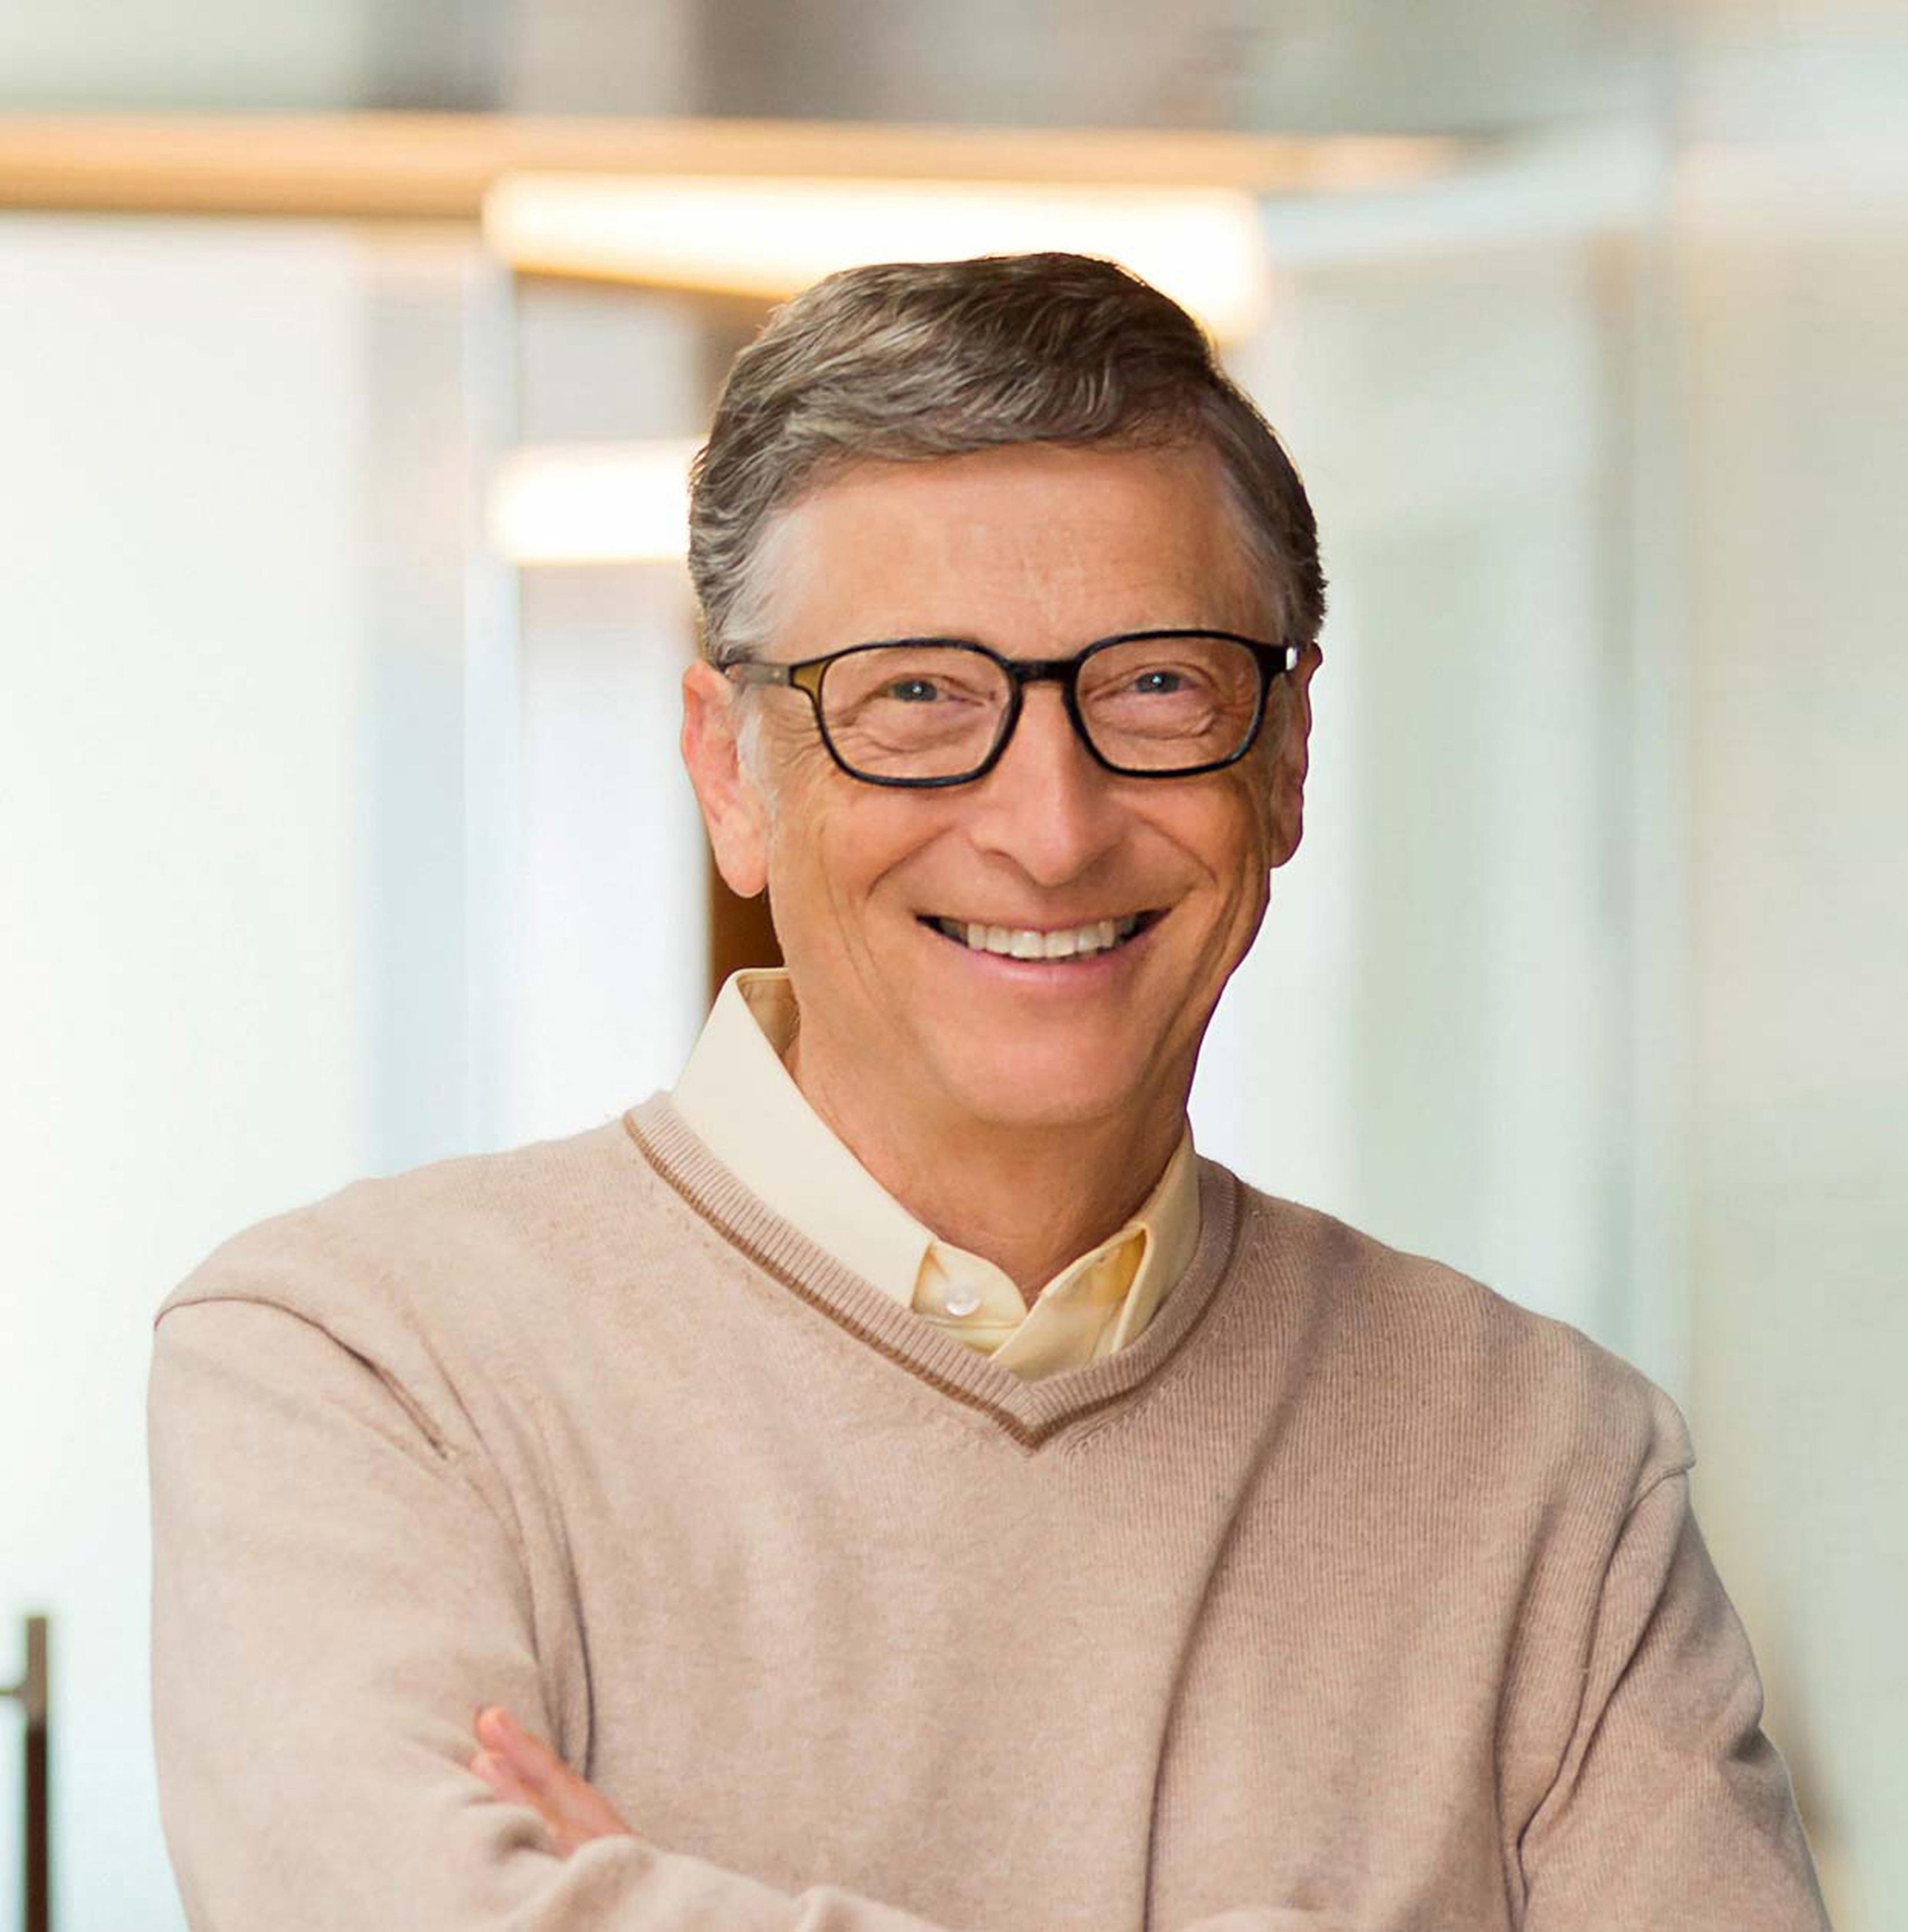 Professional portrait of Bill Gates